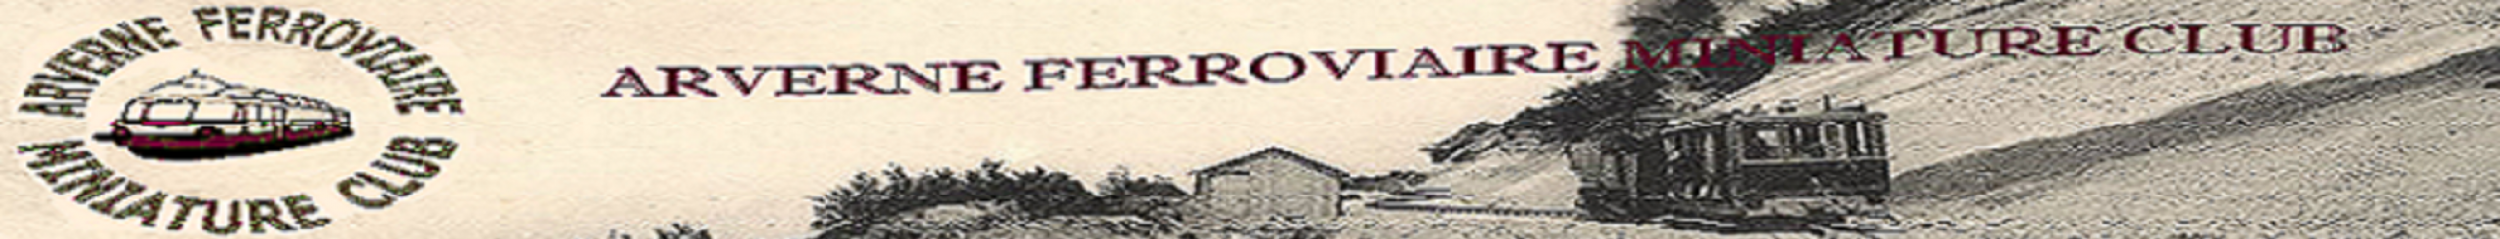 Arverne Ferroviaire Miniature Club